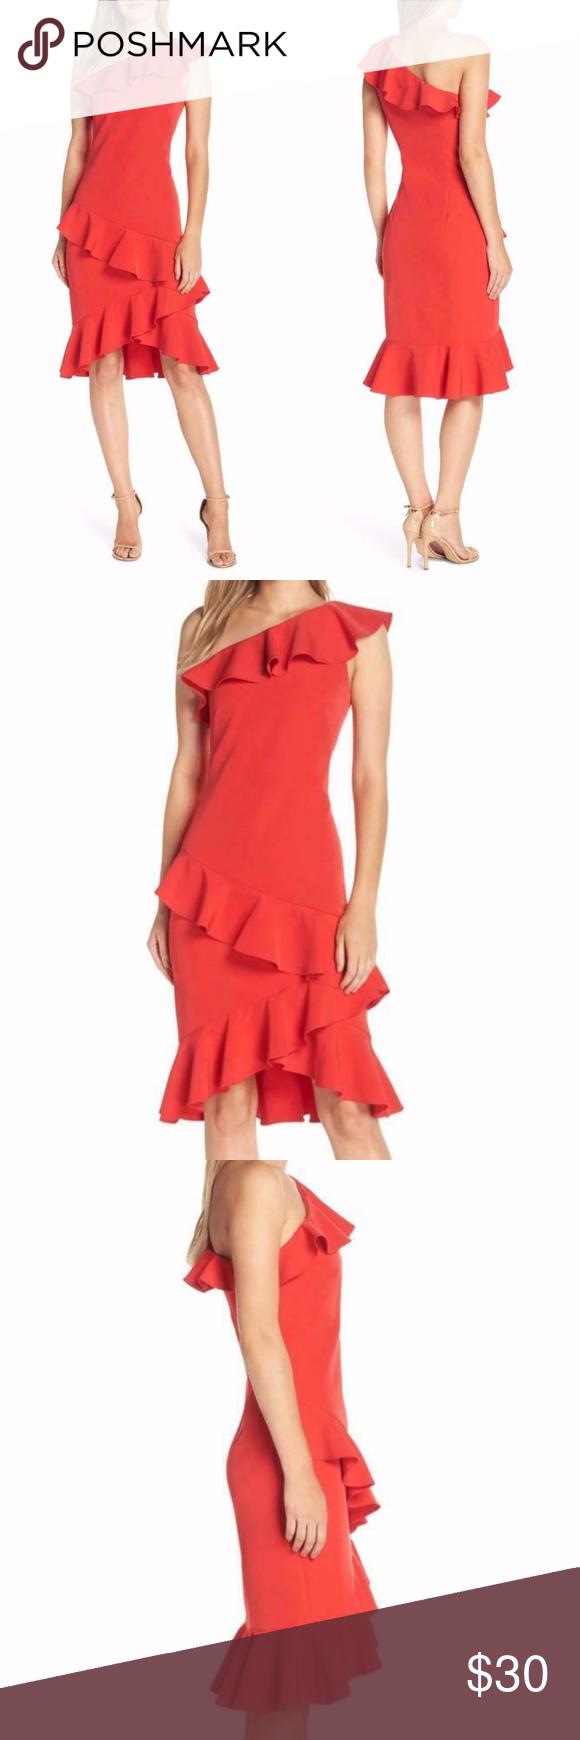 New Vince Camuto Red One Shoulder Frill Wrap Dress Wrap Dress Little Dresses Dresses [ 1740 x 580 Pixel ]